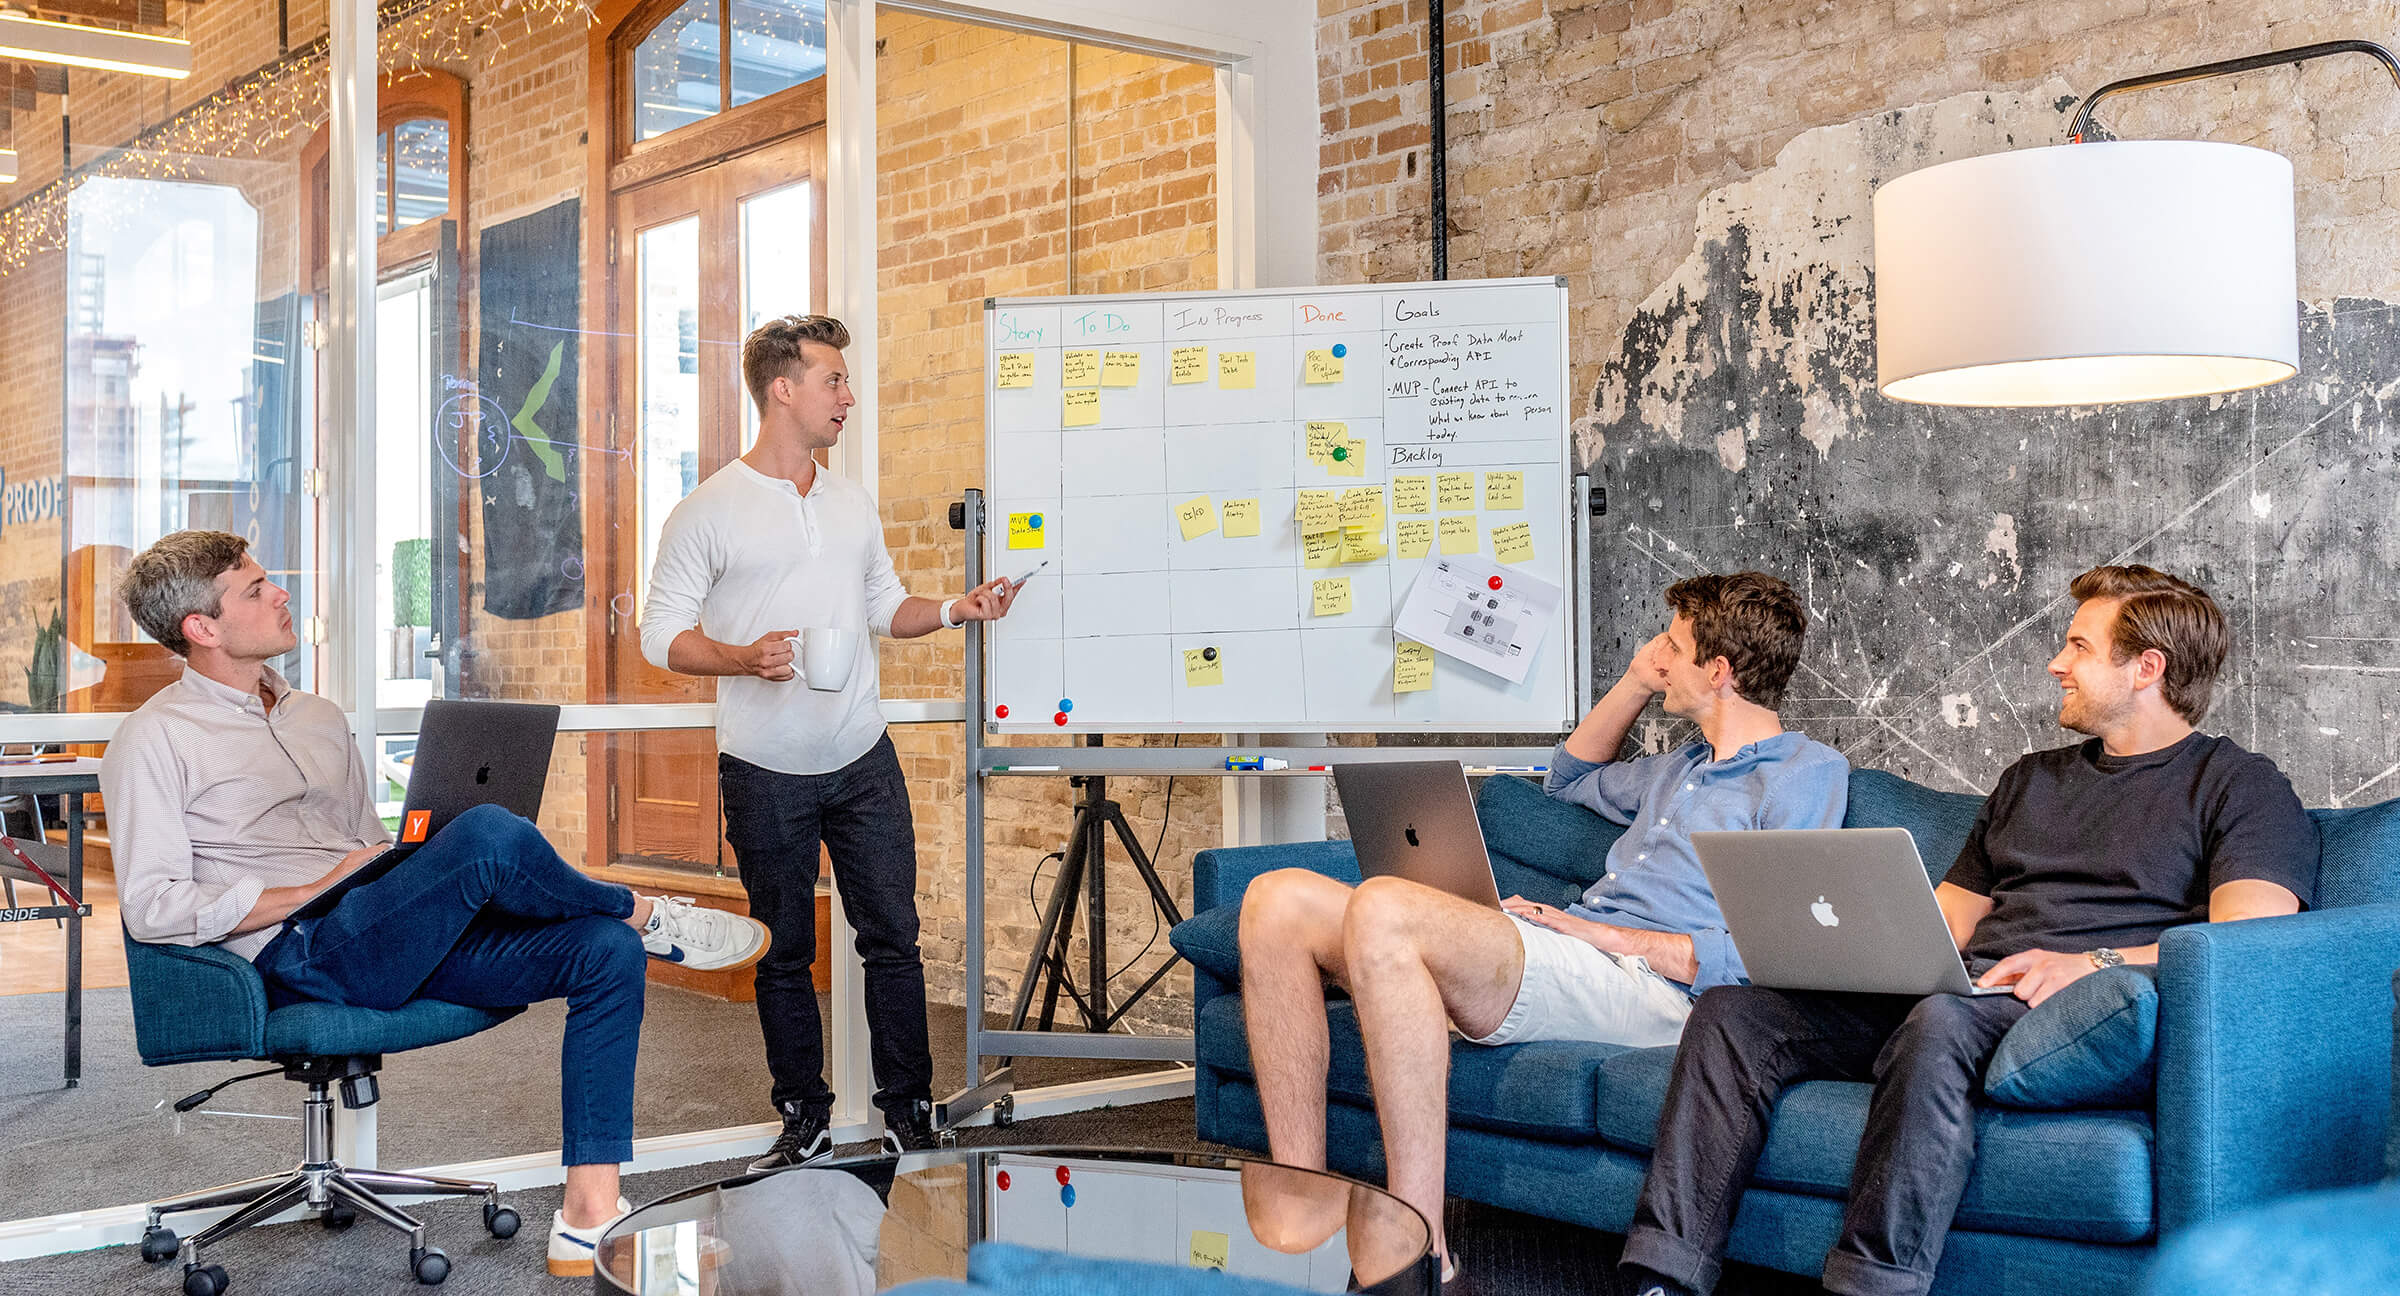 Top 5 Venture Capital Pitch Decks